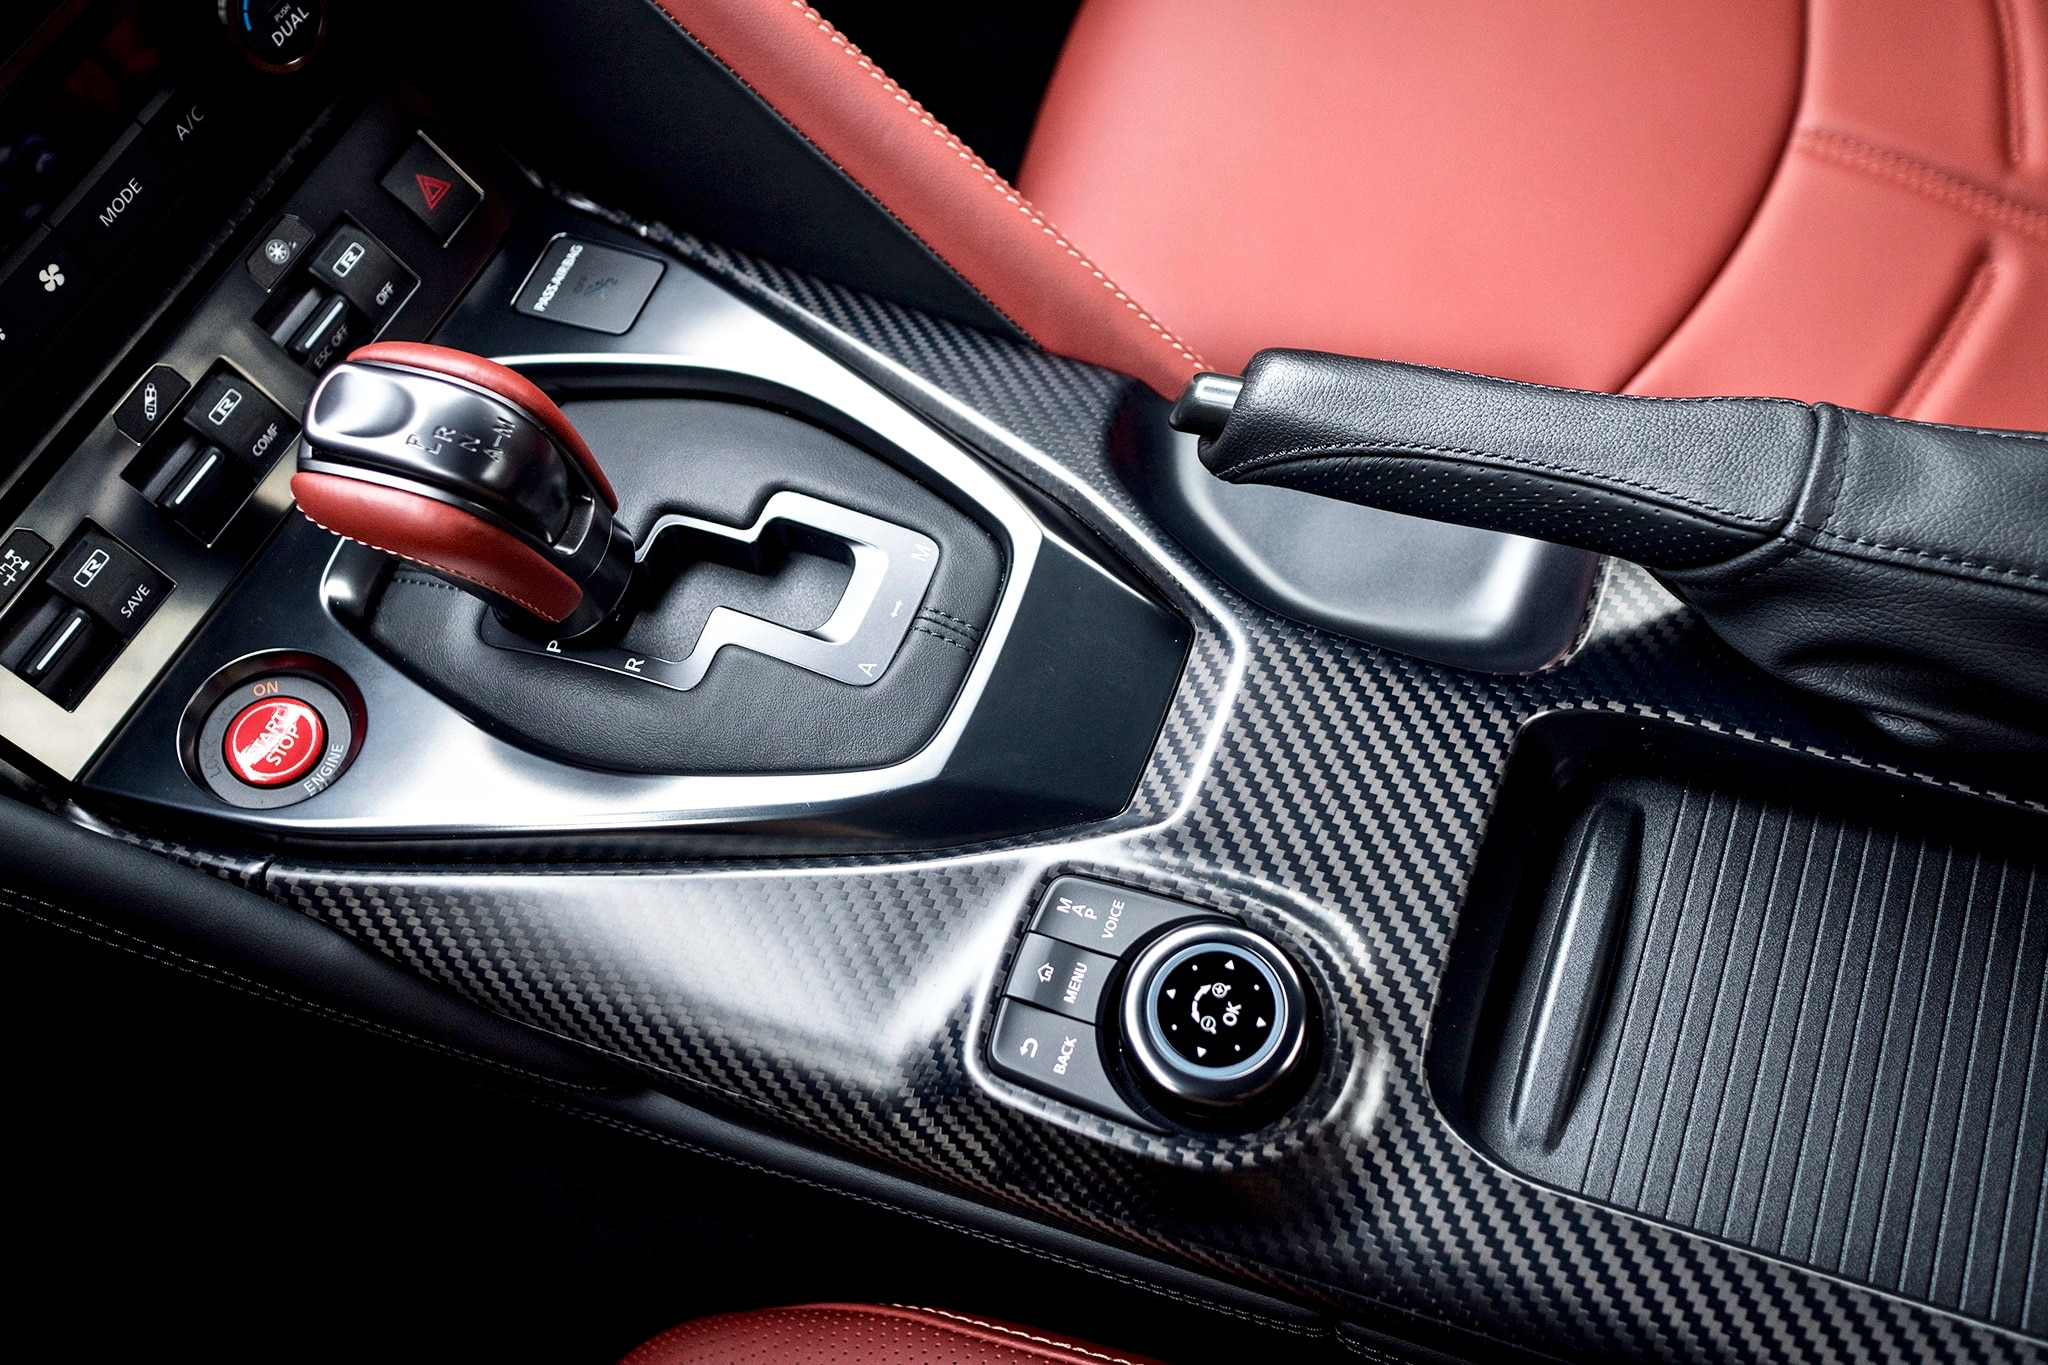 Nissan Gtr Interior >> Six Aesthetically Pleasing Interior Details On The 2018 Nissan Gt R